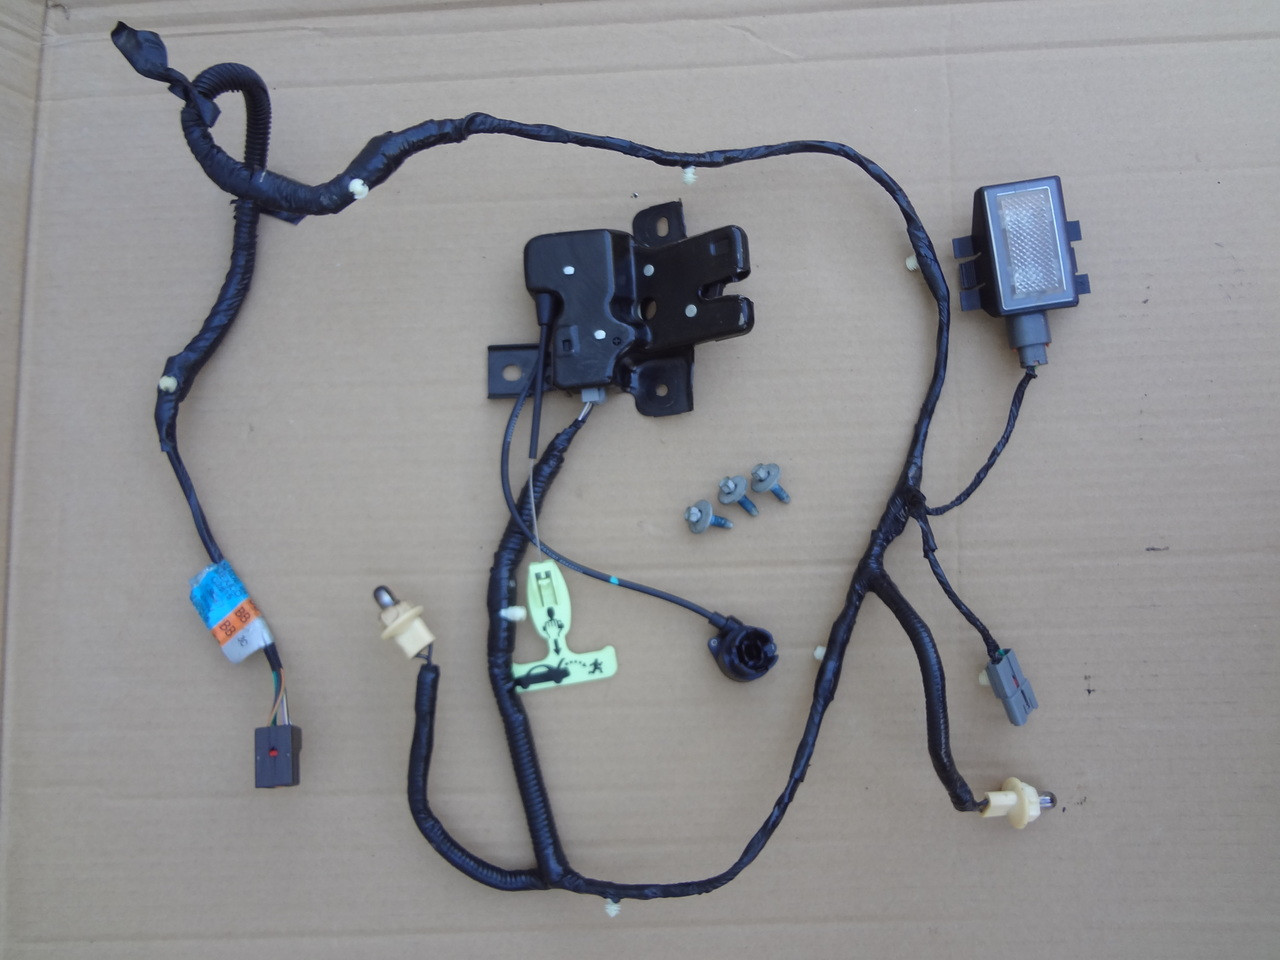 hight resolution of 2003 2004 mustang cobra trunk latch light wire harness 3r3v 14290 g2816